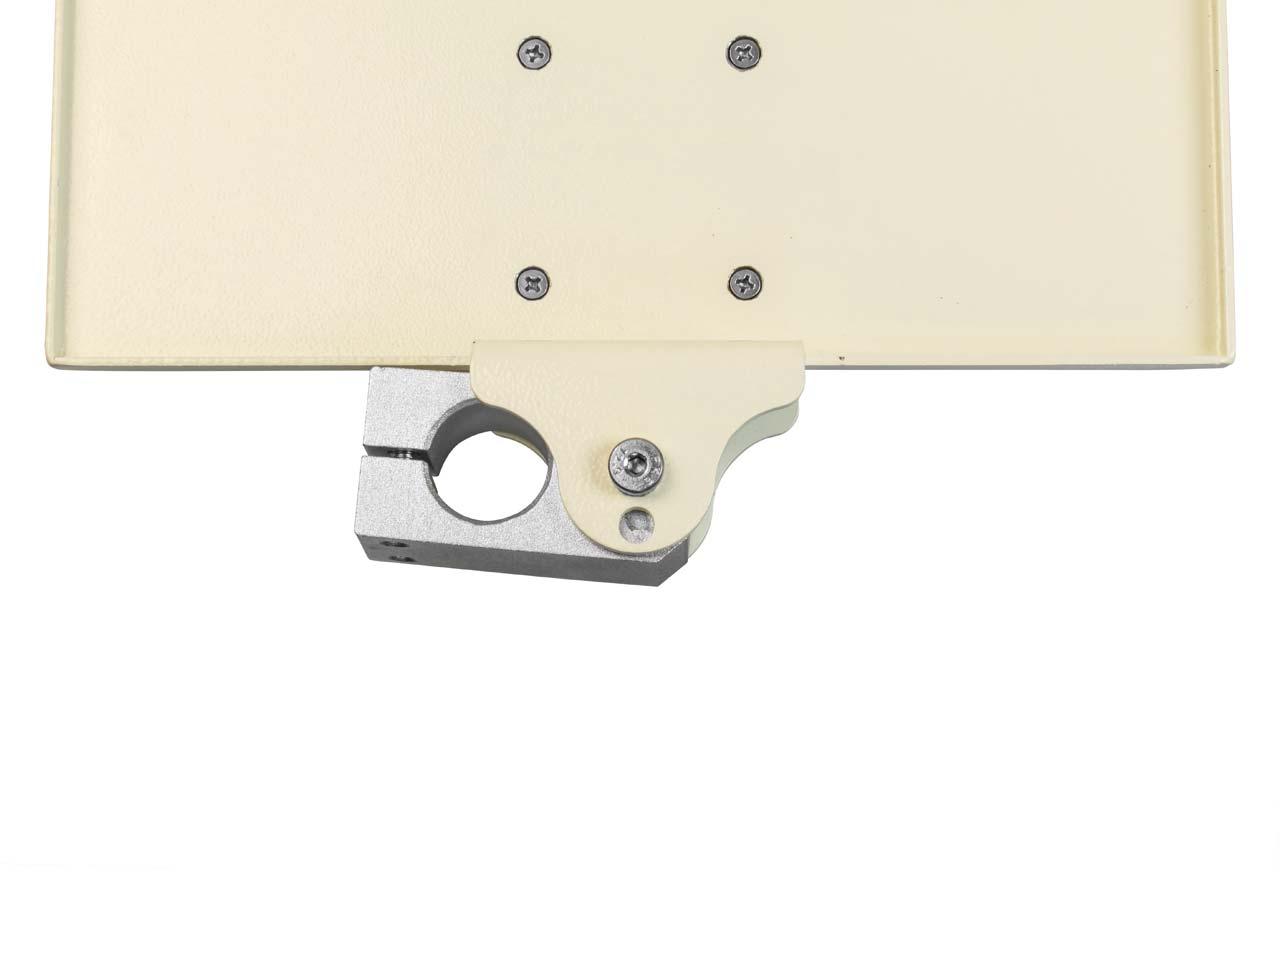 Genuine-US-Foredom-Workbench-Accessories-System miniatura 39